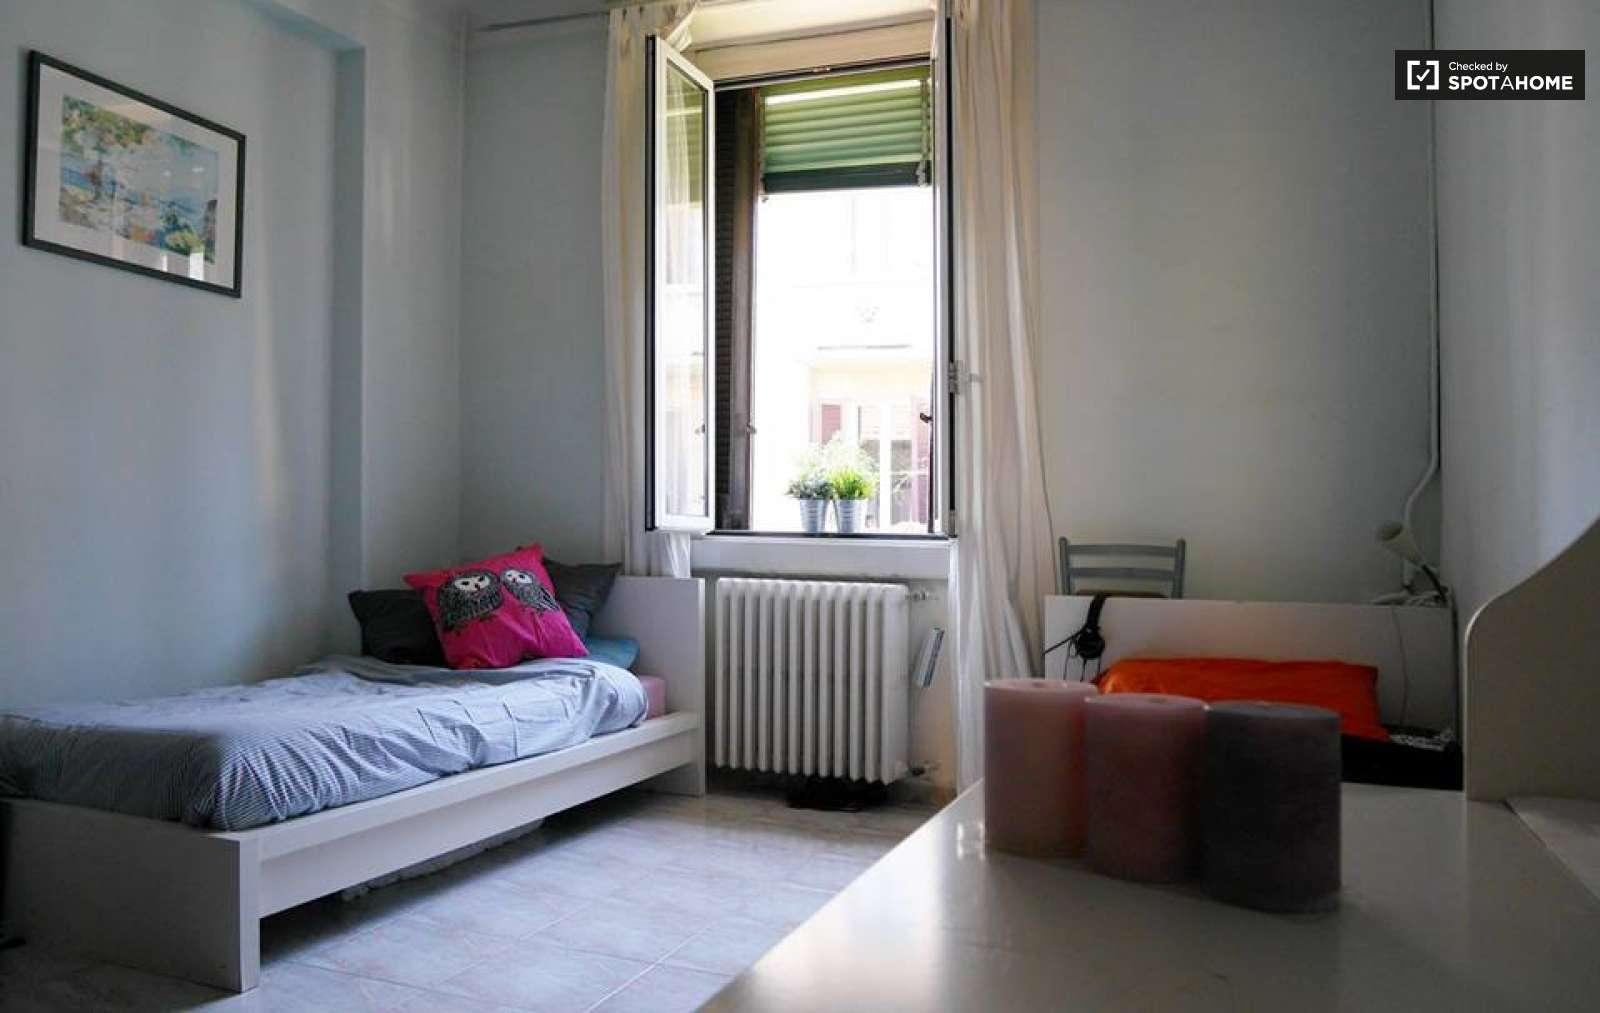 Milano Bedroom Furniture Rooms For Rent Near Politecnico Di Milano Milan Spotahome